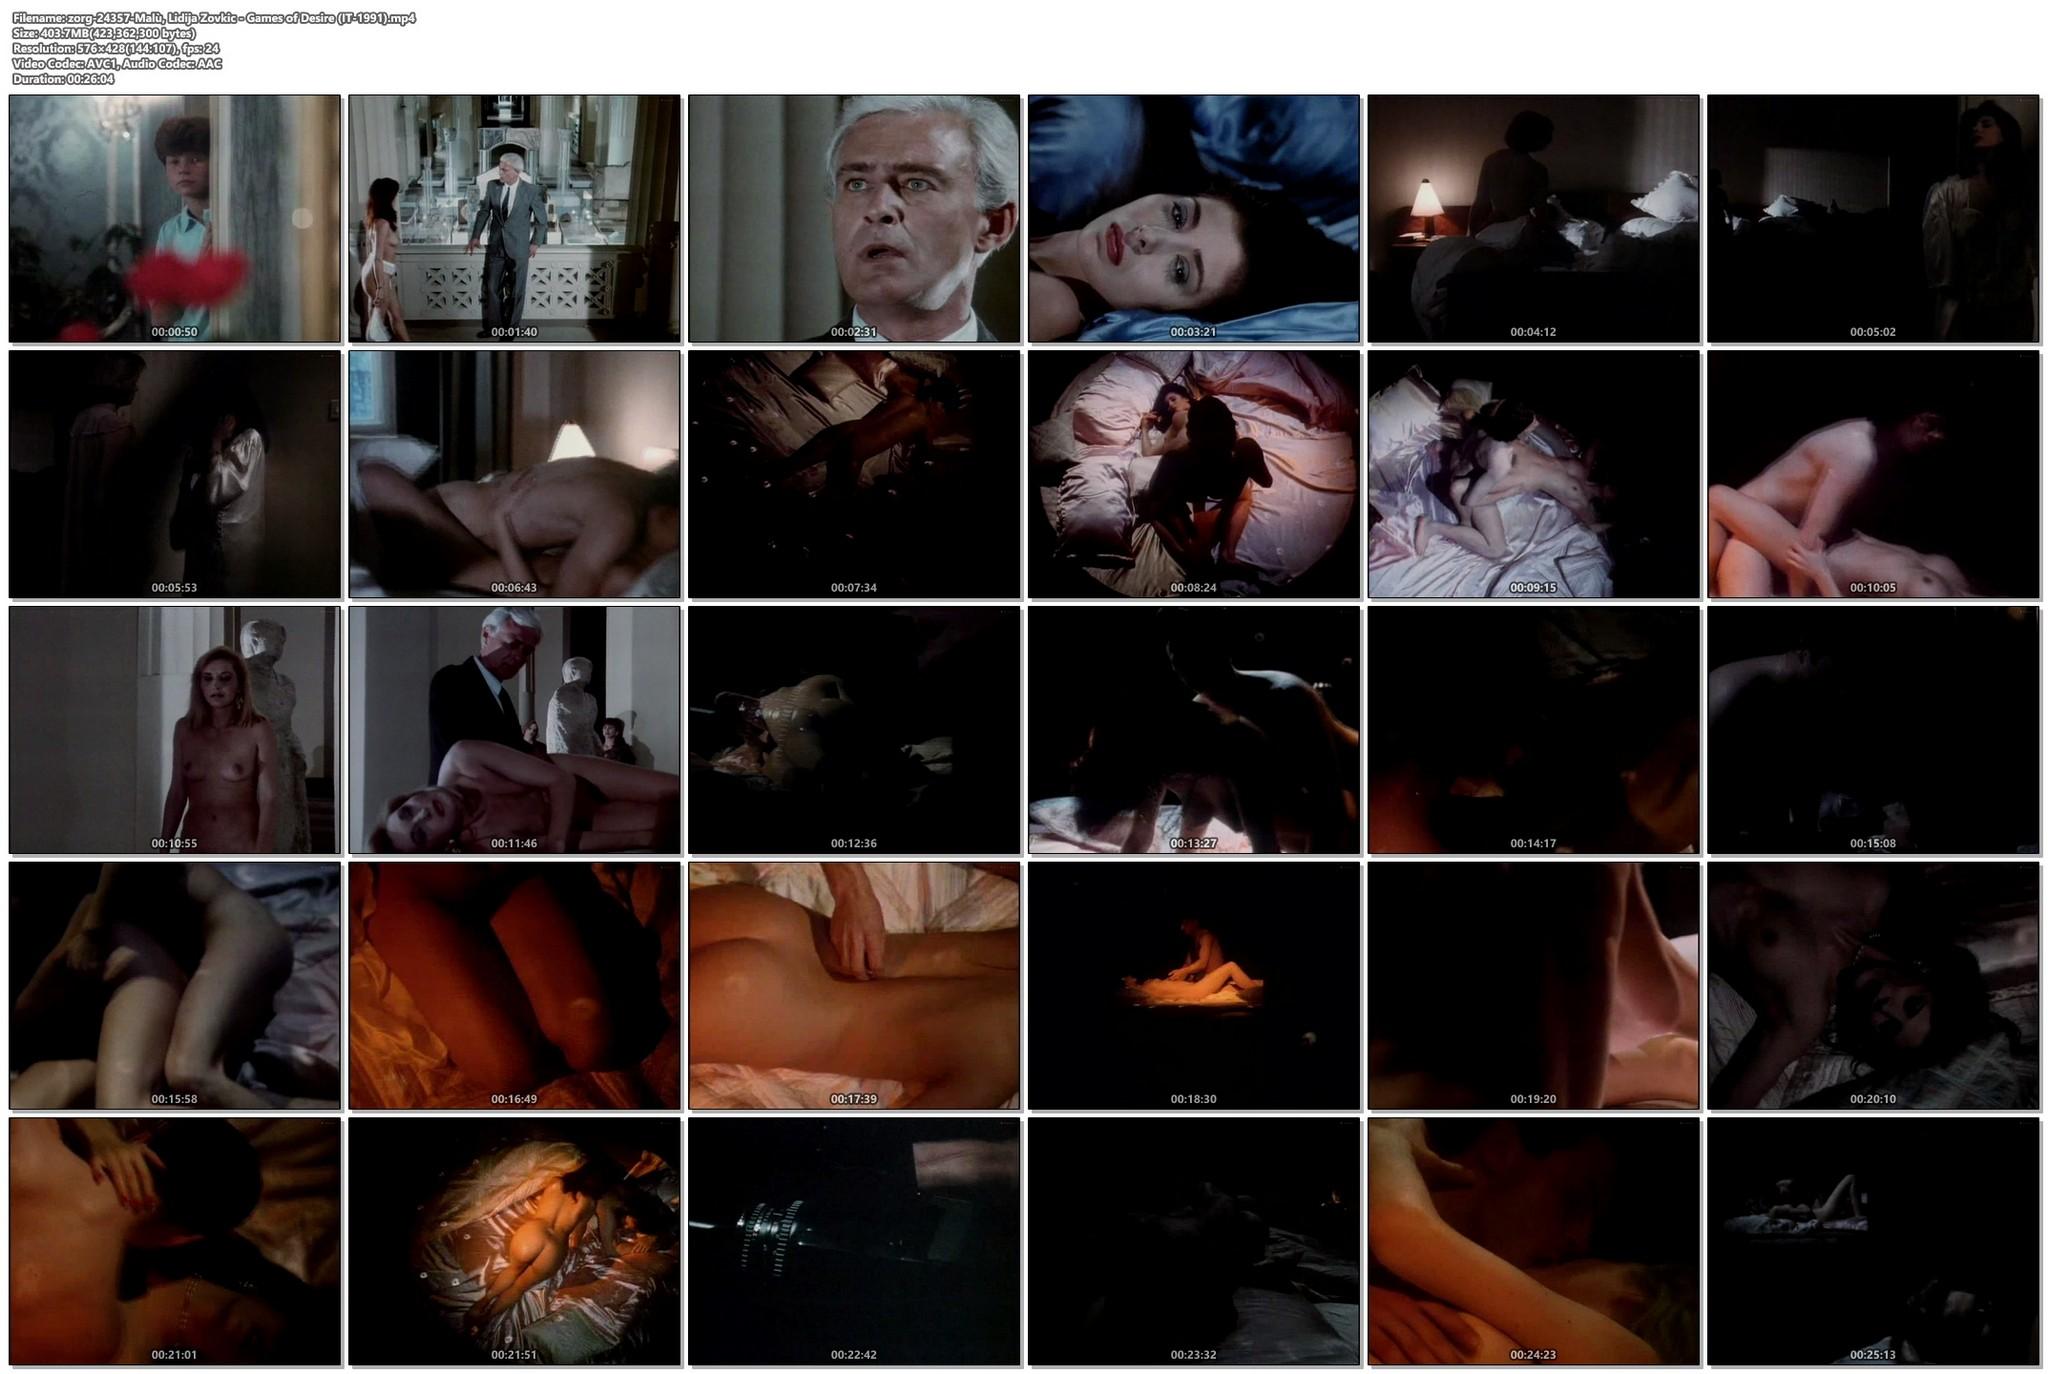 Malu nude full frontal and sex Lidija Zovkic Games of Desire IT 1991 VHSrip 017